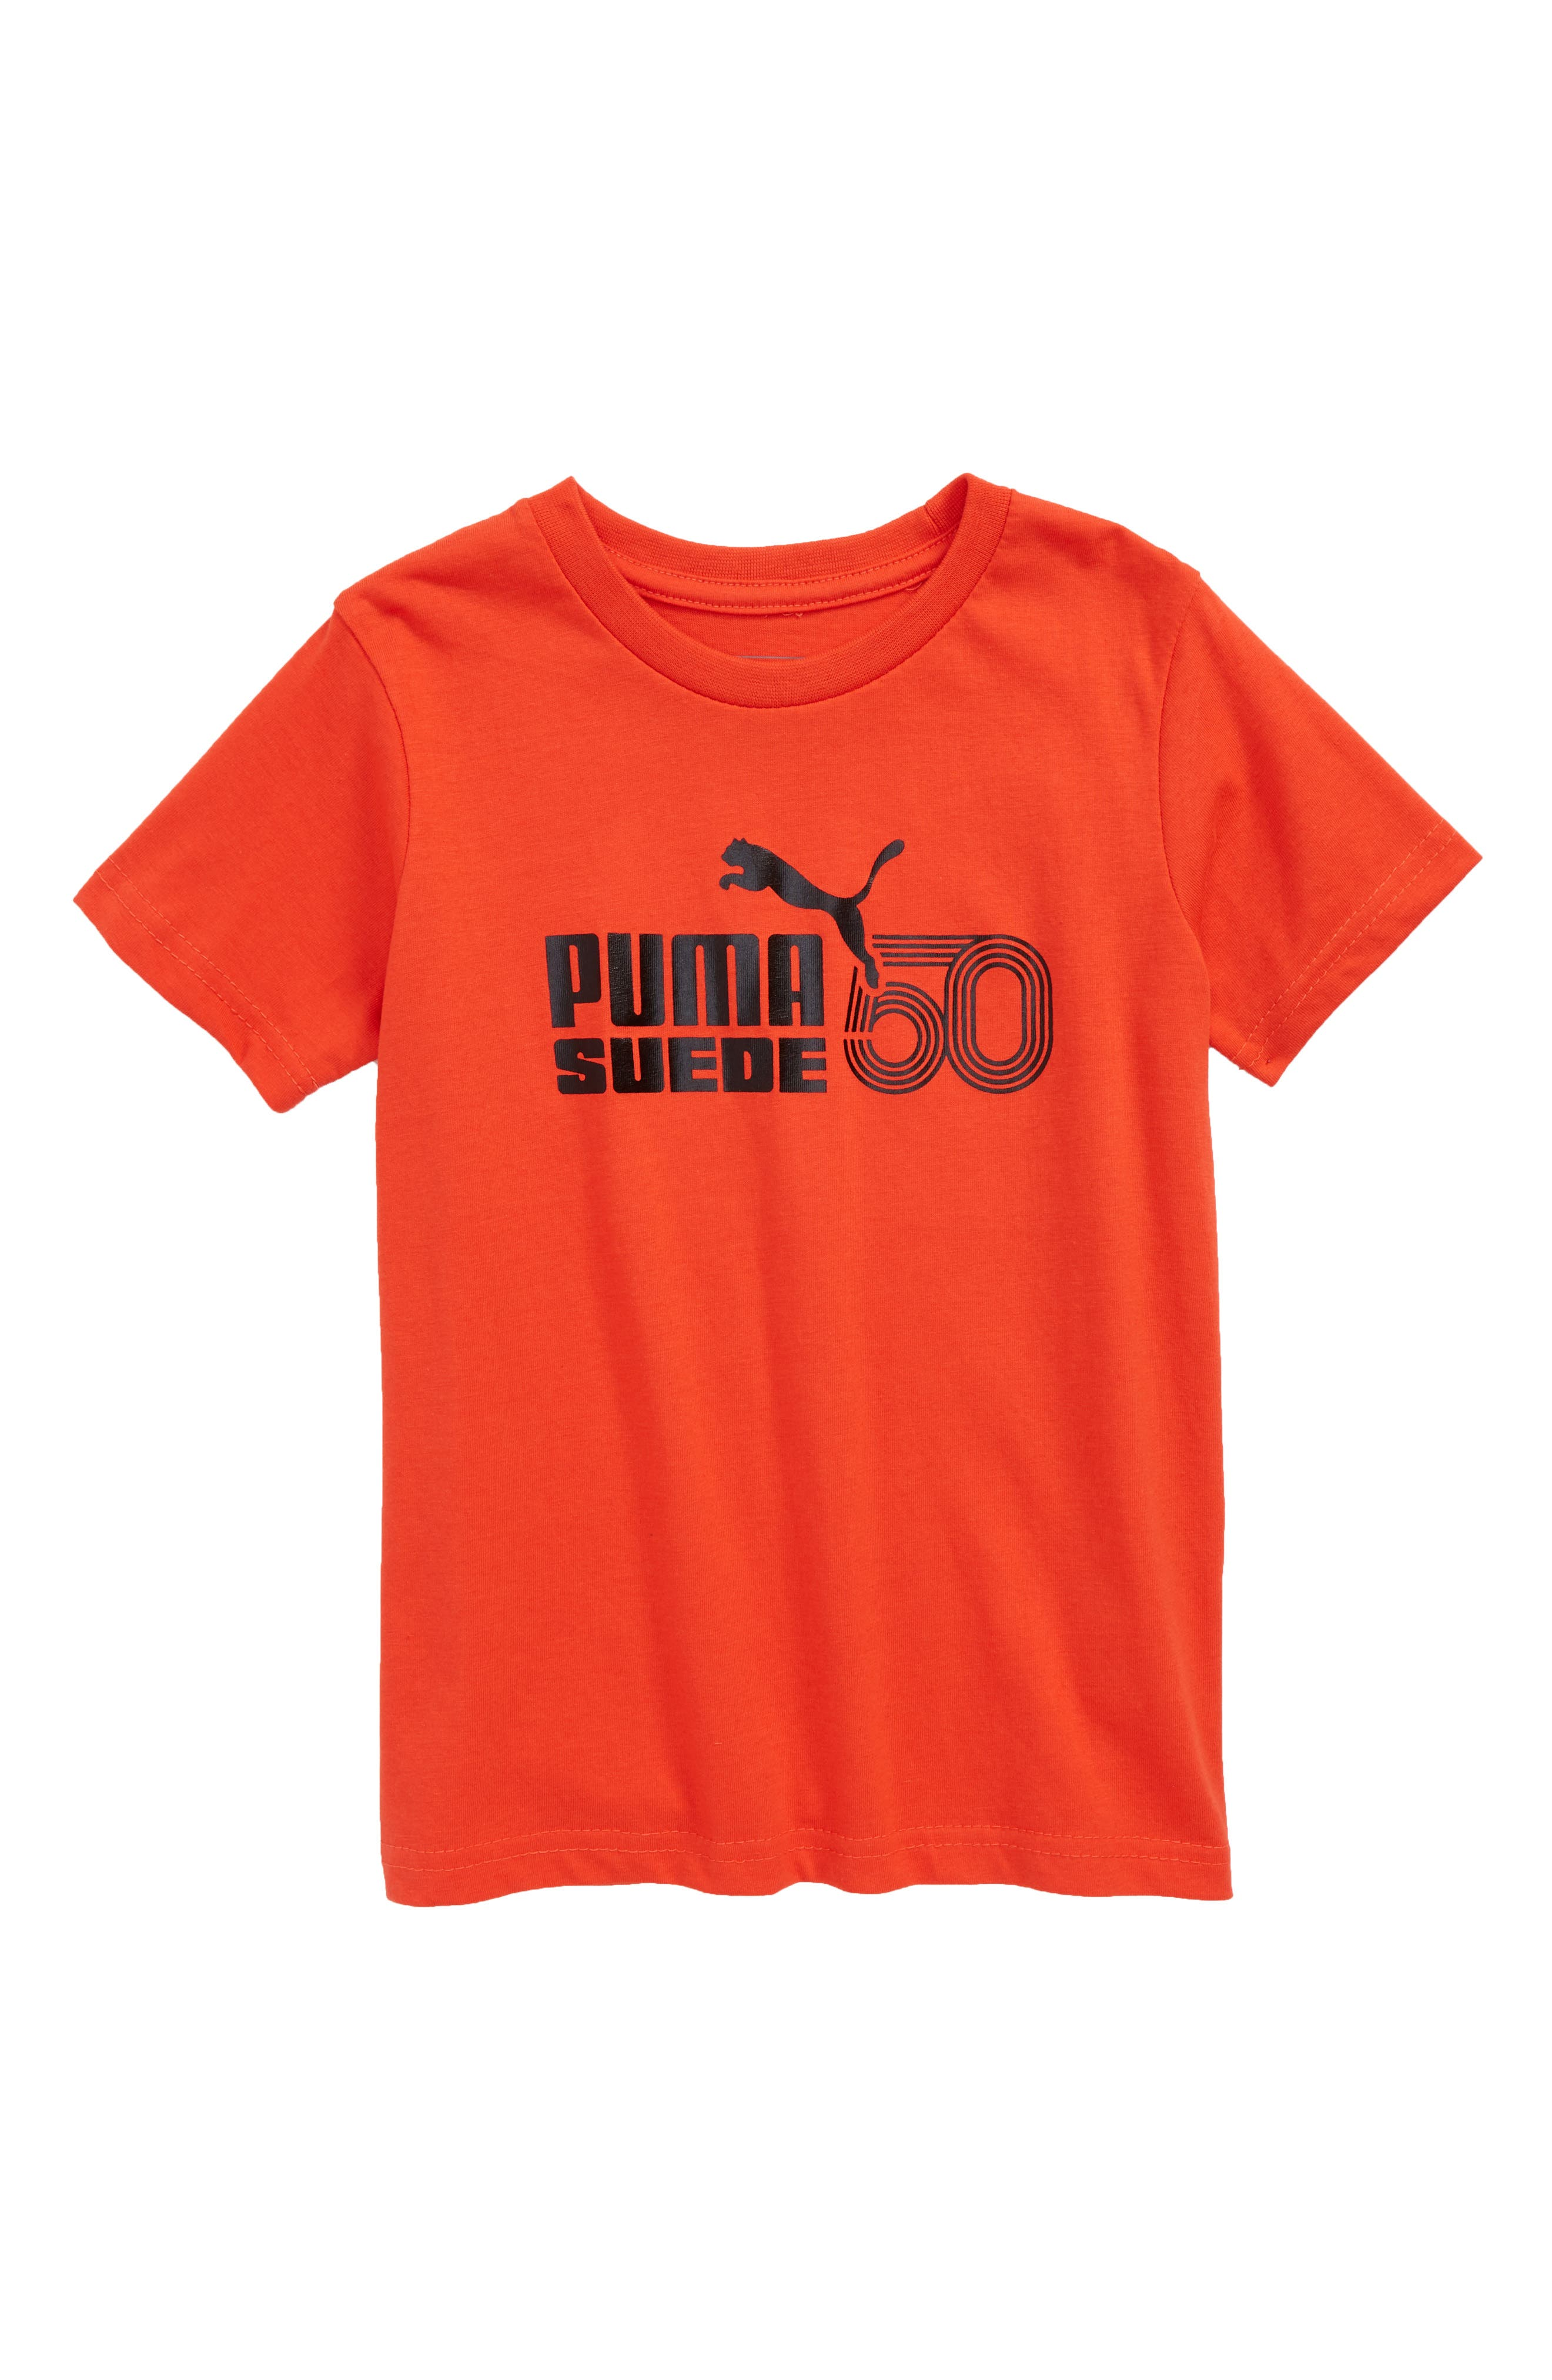 PUMA Logo Graphic T-Shirt (Little Boys)